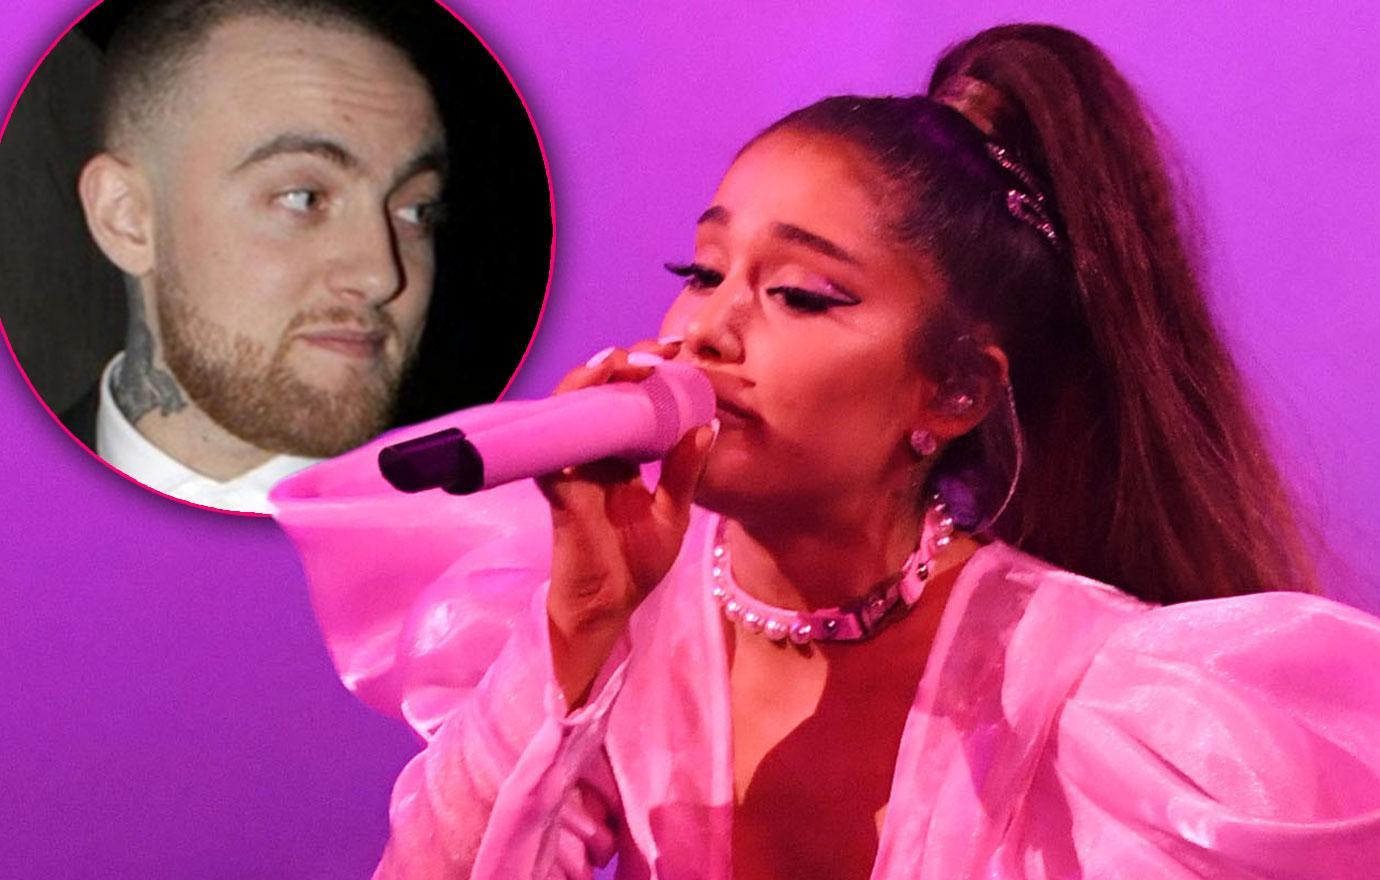 Ariana Grande Kicks Off 'Sweetener Tour' With Musical Tribute To Mac Miller